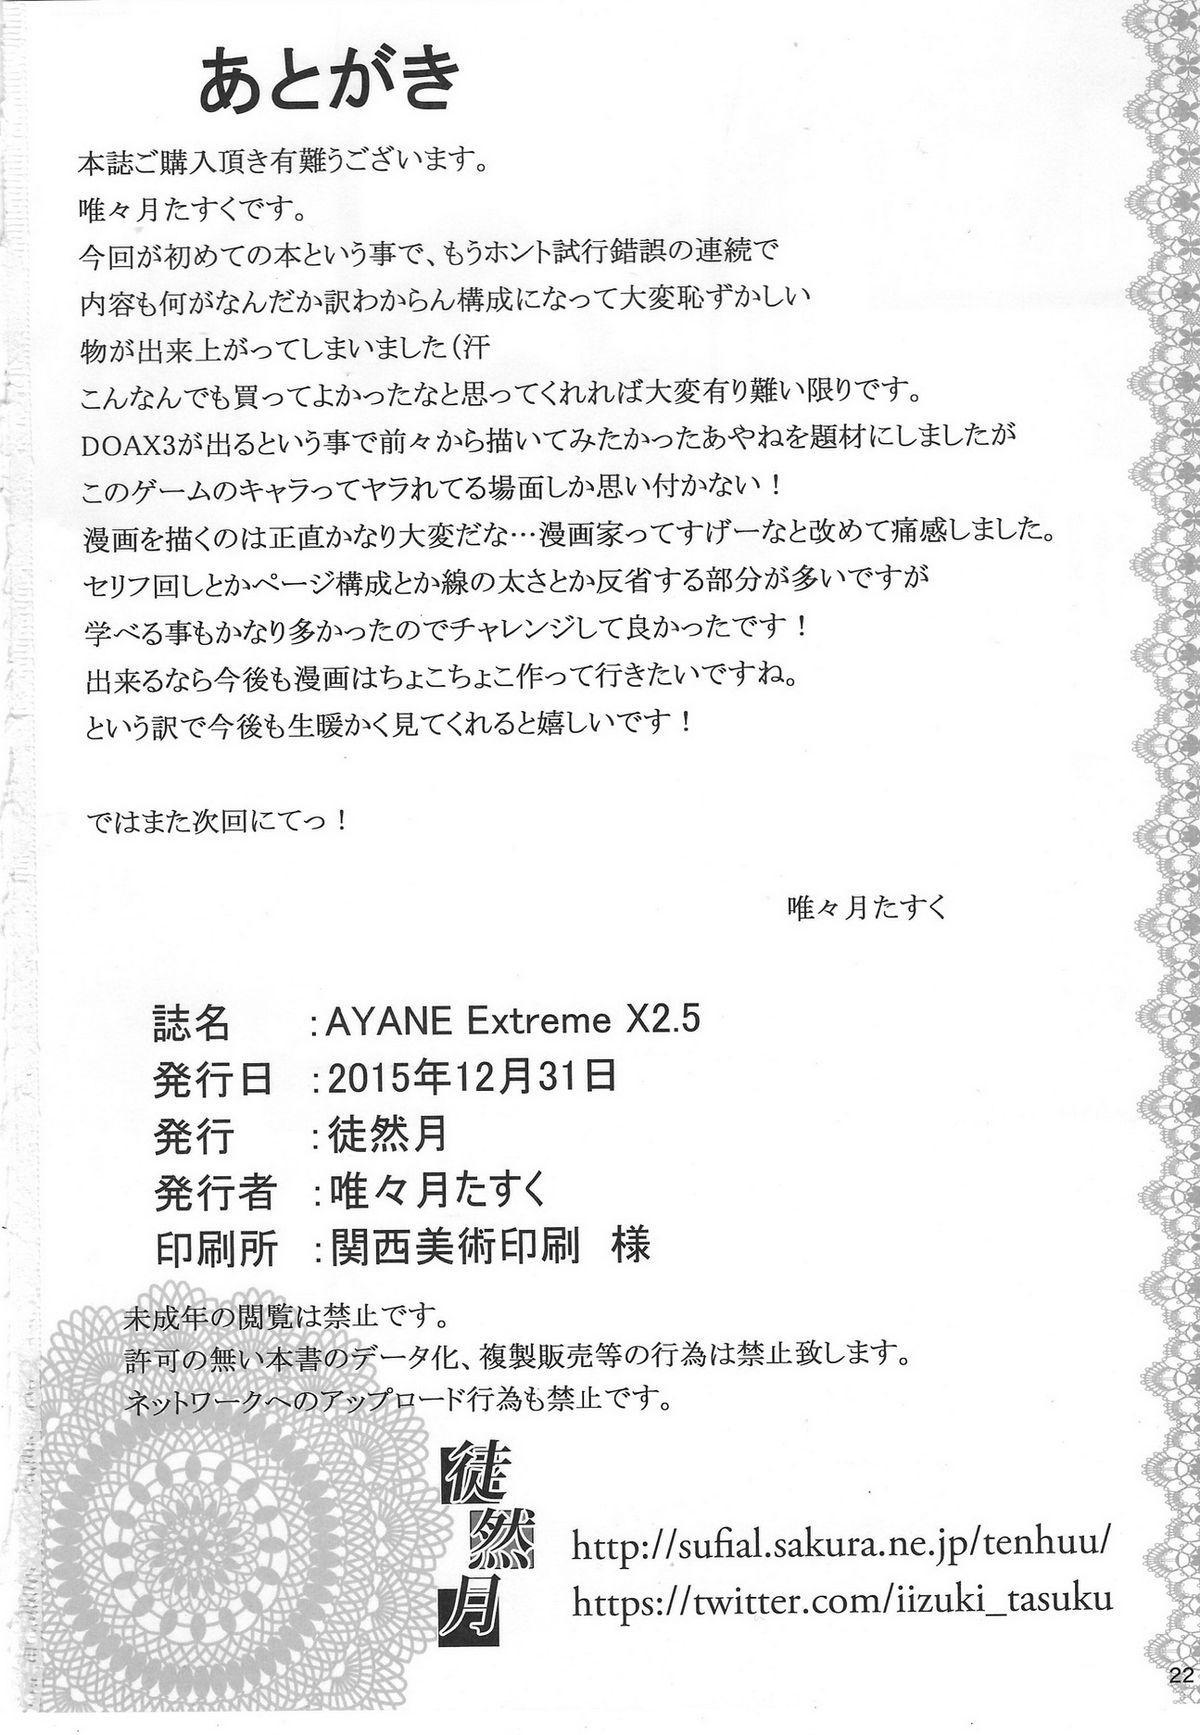 AYANE Extreme X2.5 21